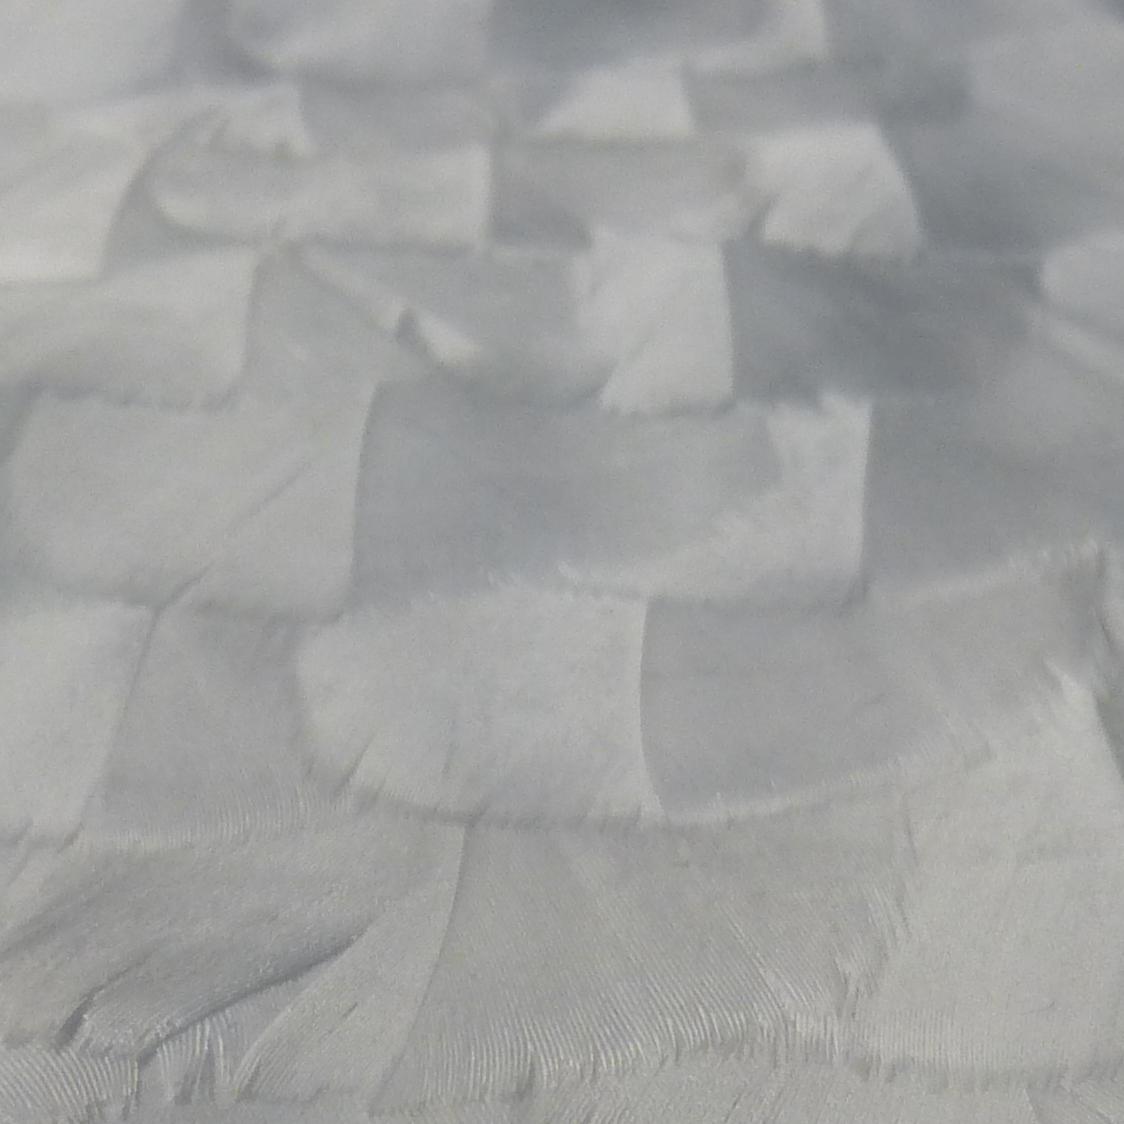 White Surface - Photo 4